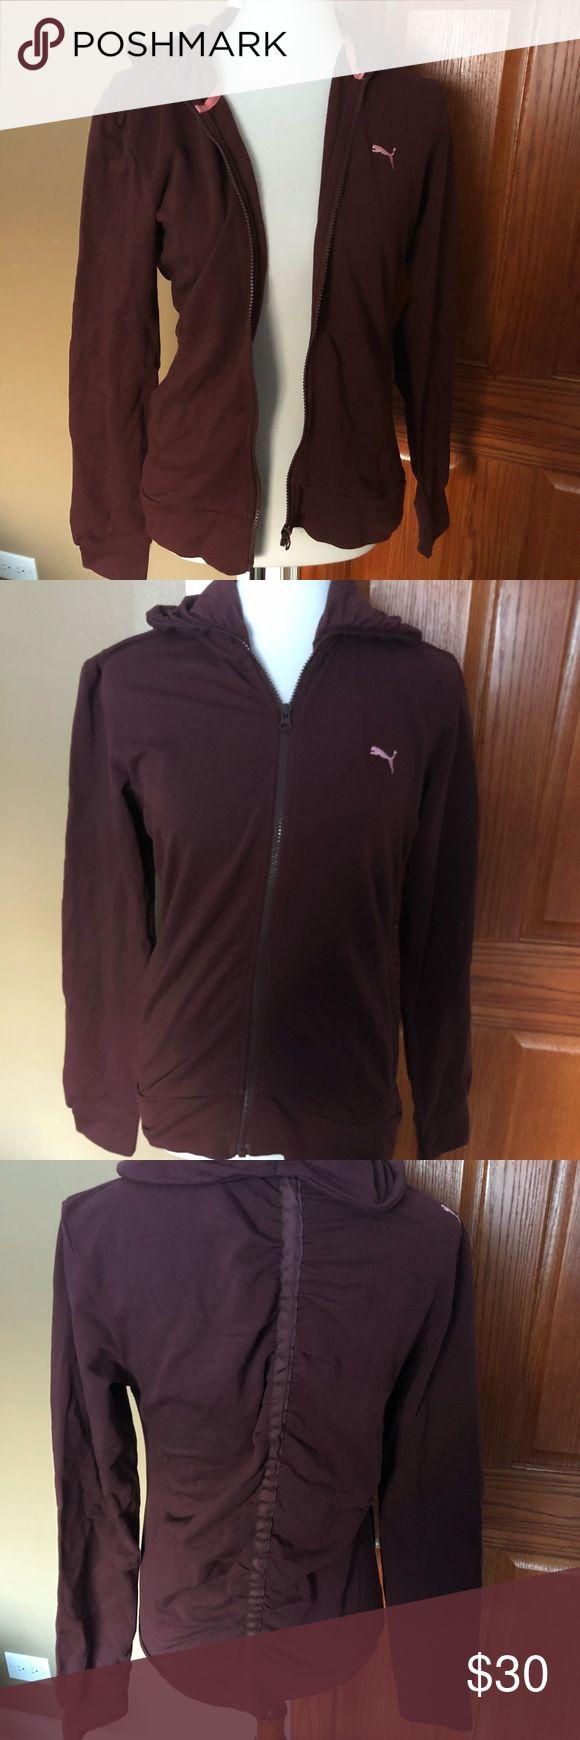 Burgundy puma zip up Stretchy burgundy puma full zip sweater with detail in back Puma Tops Sweatshirts & Hoodies